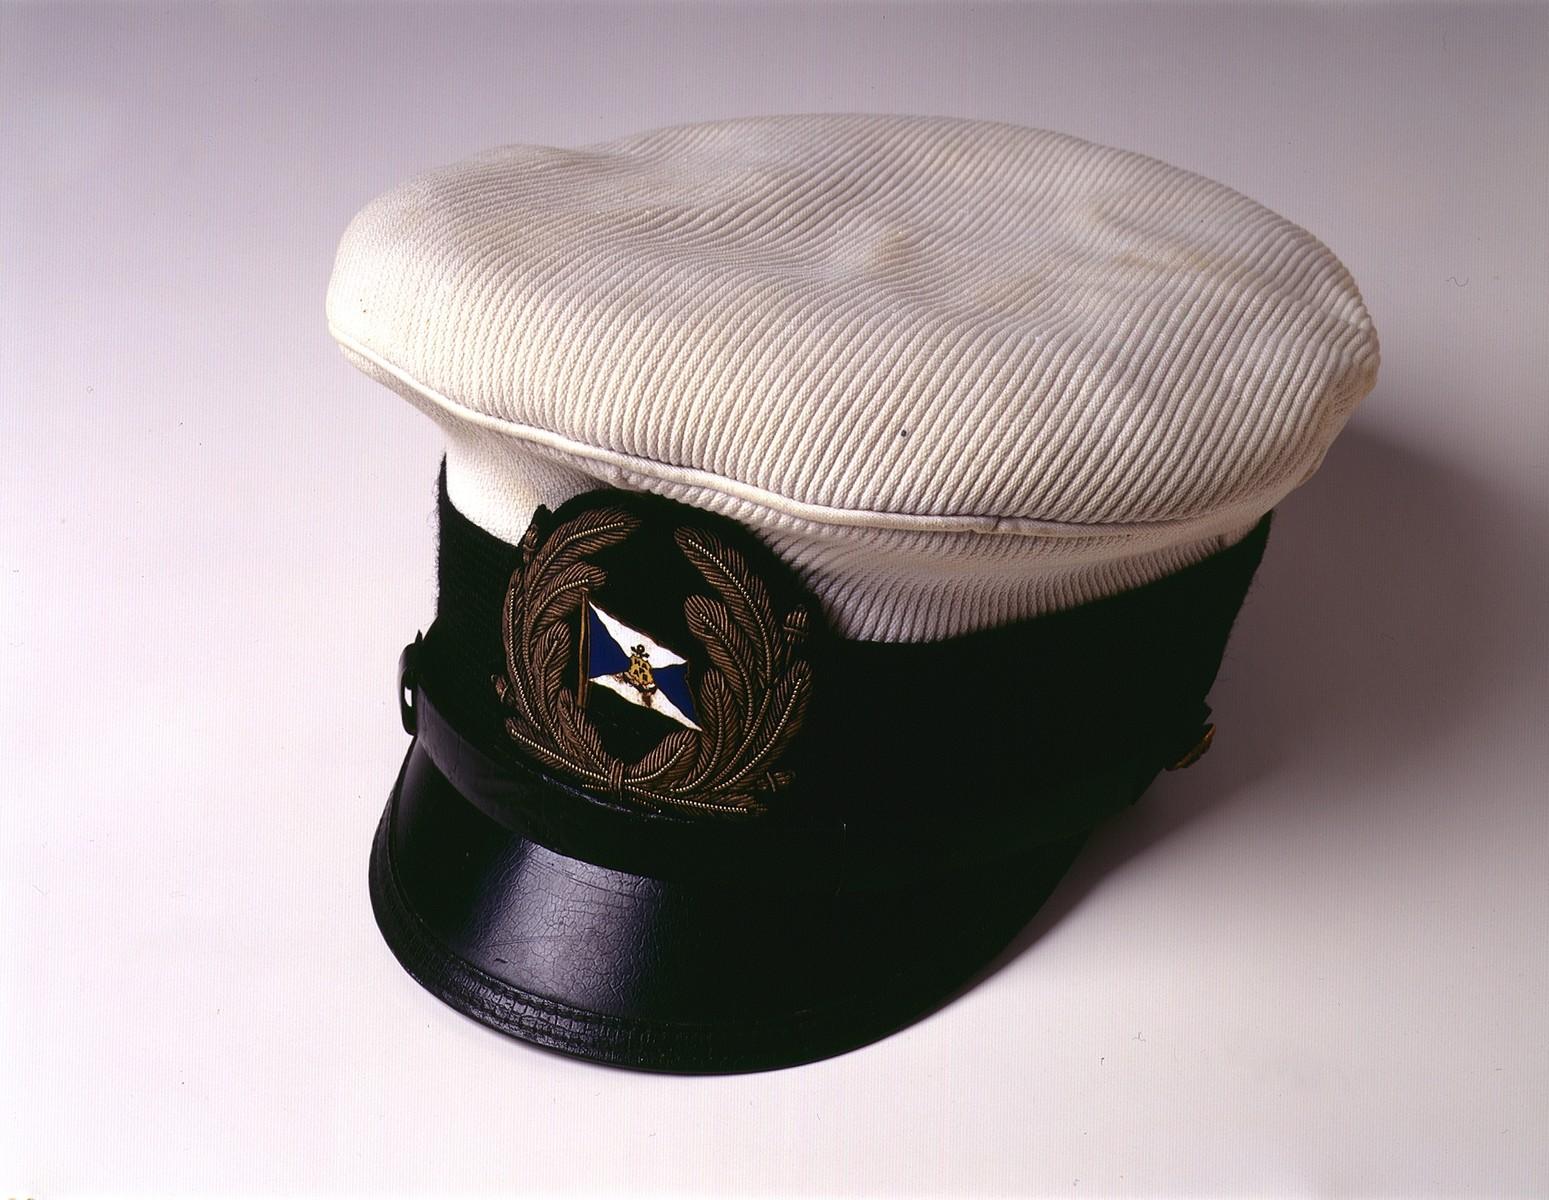 Cap worn by Gustav Schroeder, captain of the MS St. Louis.